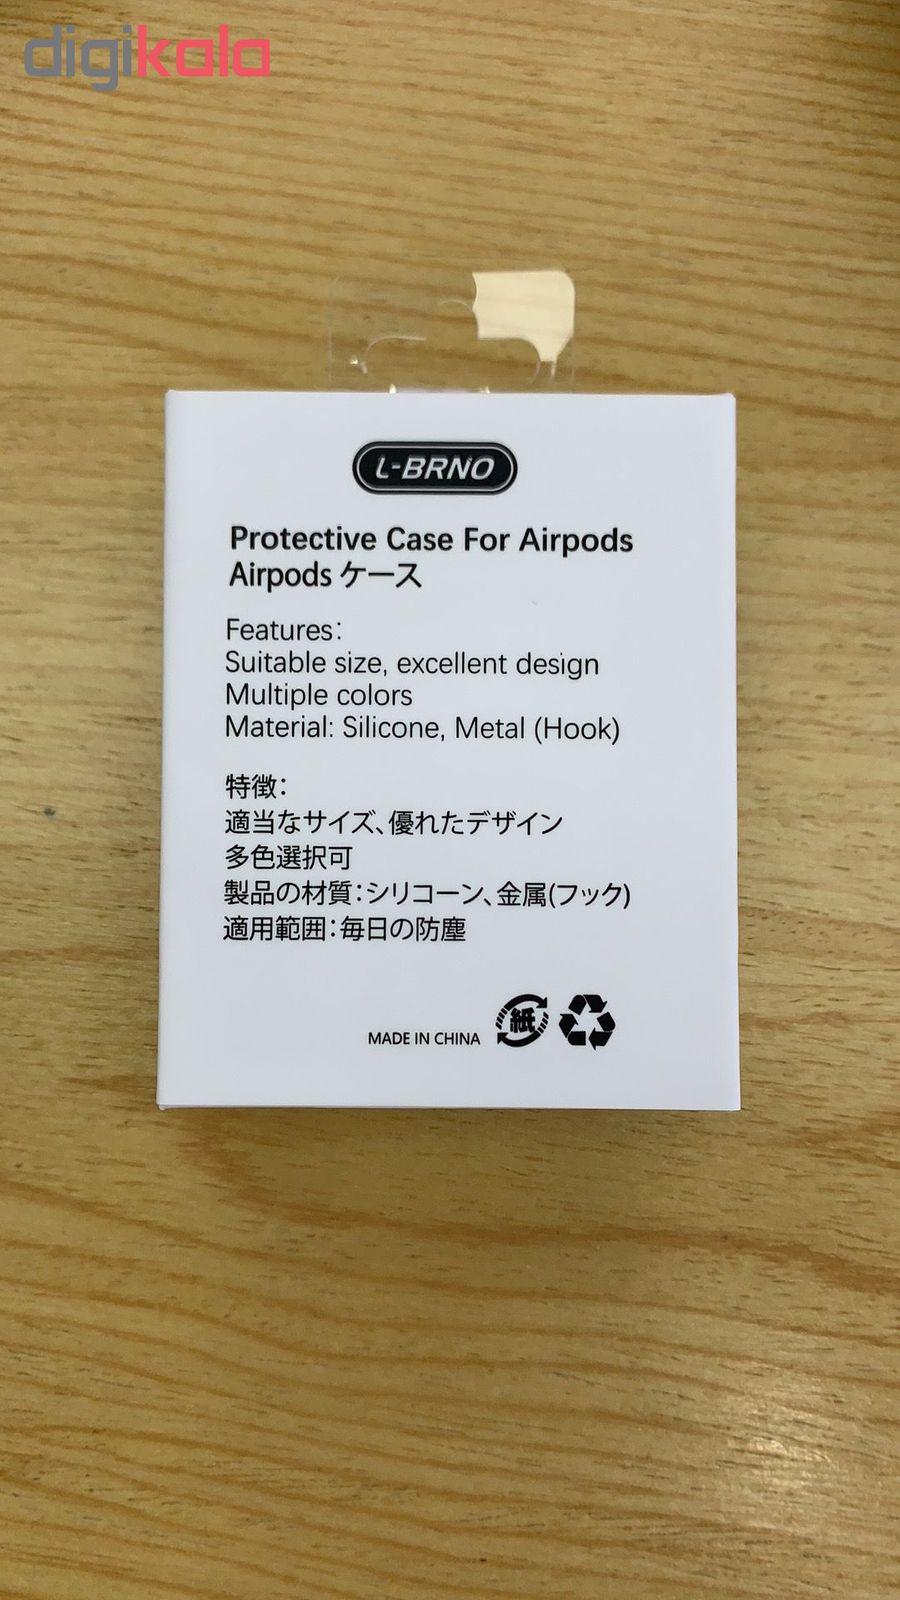 کاور البرنو مدل J۲ مناسب برای کیس اپل ایرپاد 1/2 main 1 13